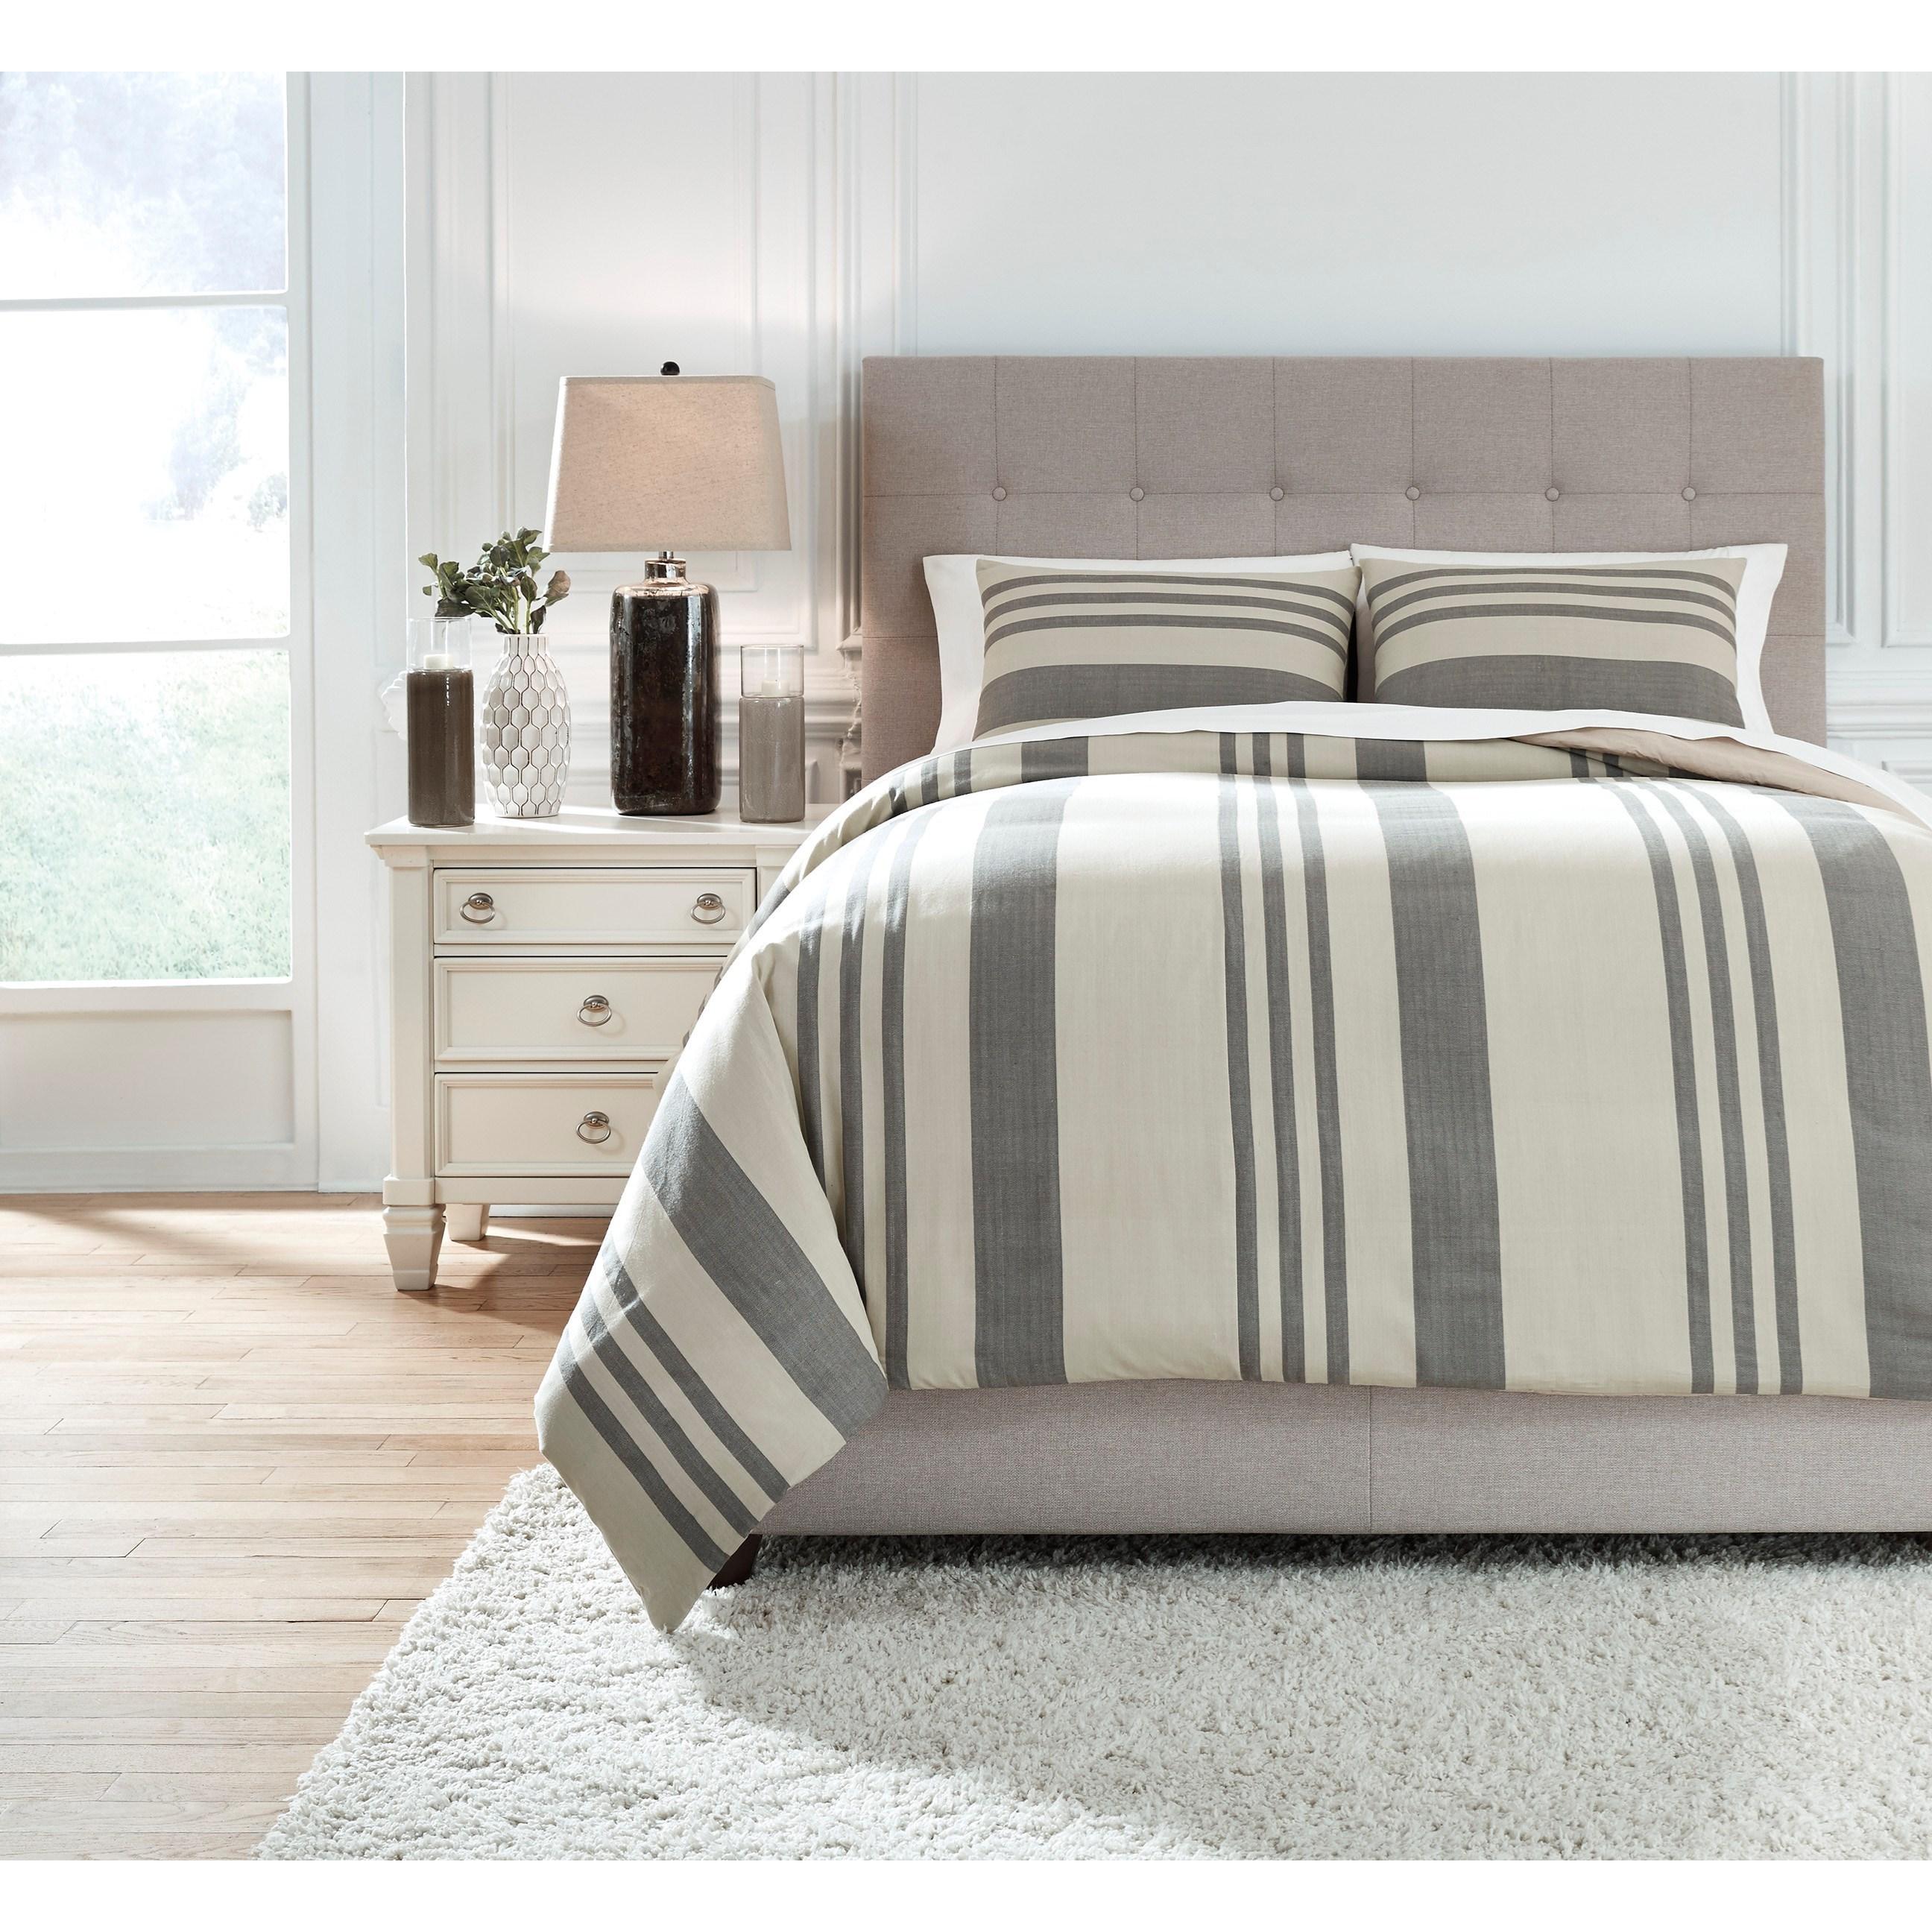 Queen Schukei Natural/Charcoal Comforter Set